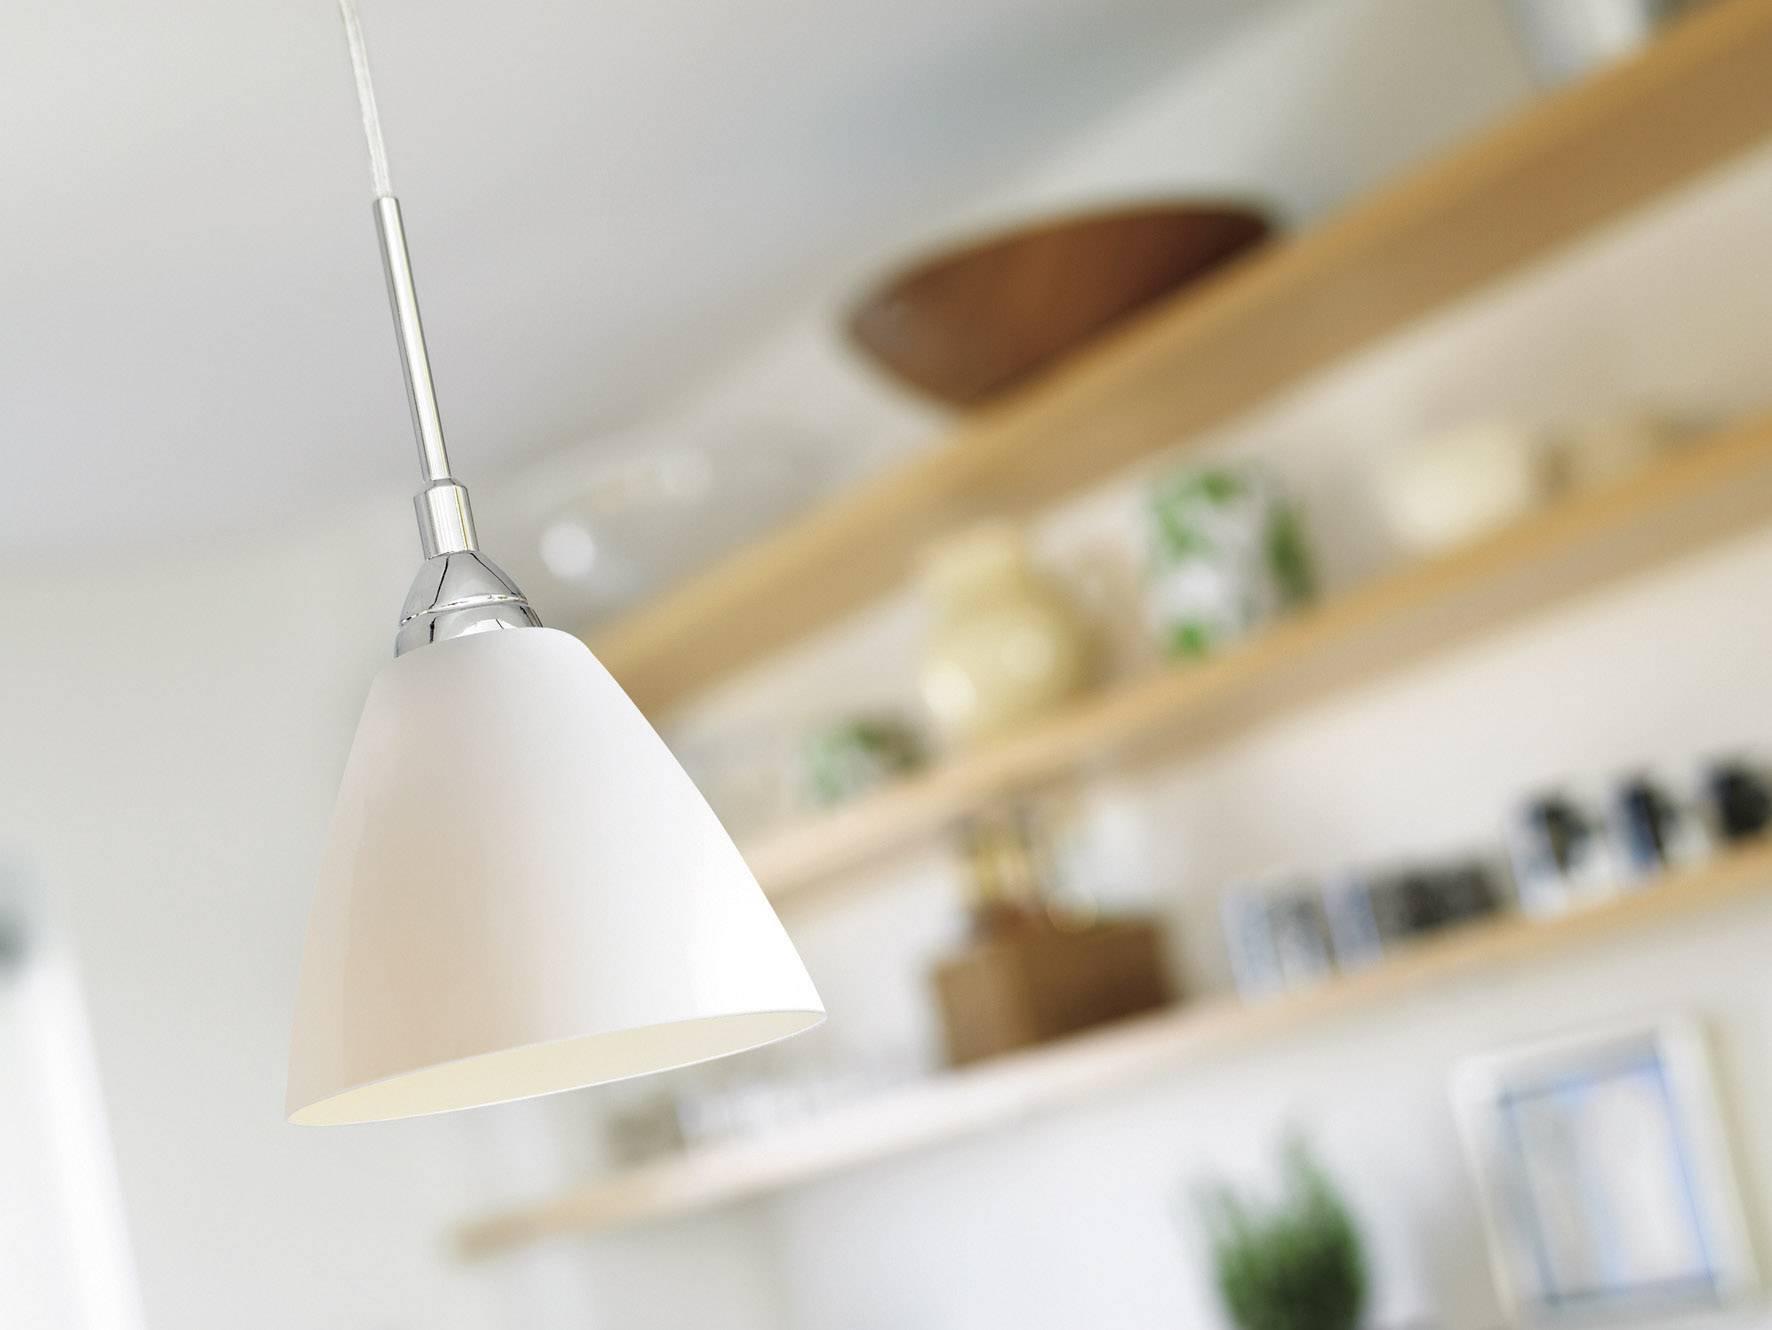 Závesné svietidlo halogénová žiarovka, LED Nordlux Read 14 73153010, E14, 40 W, biela